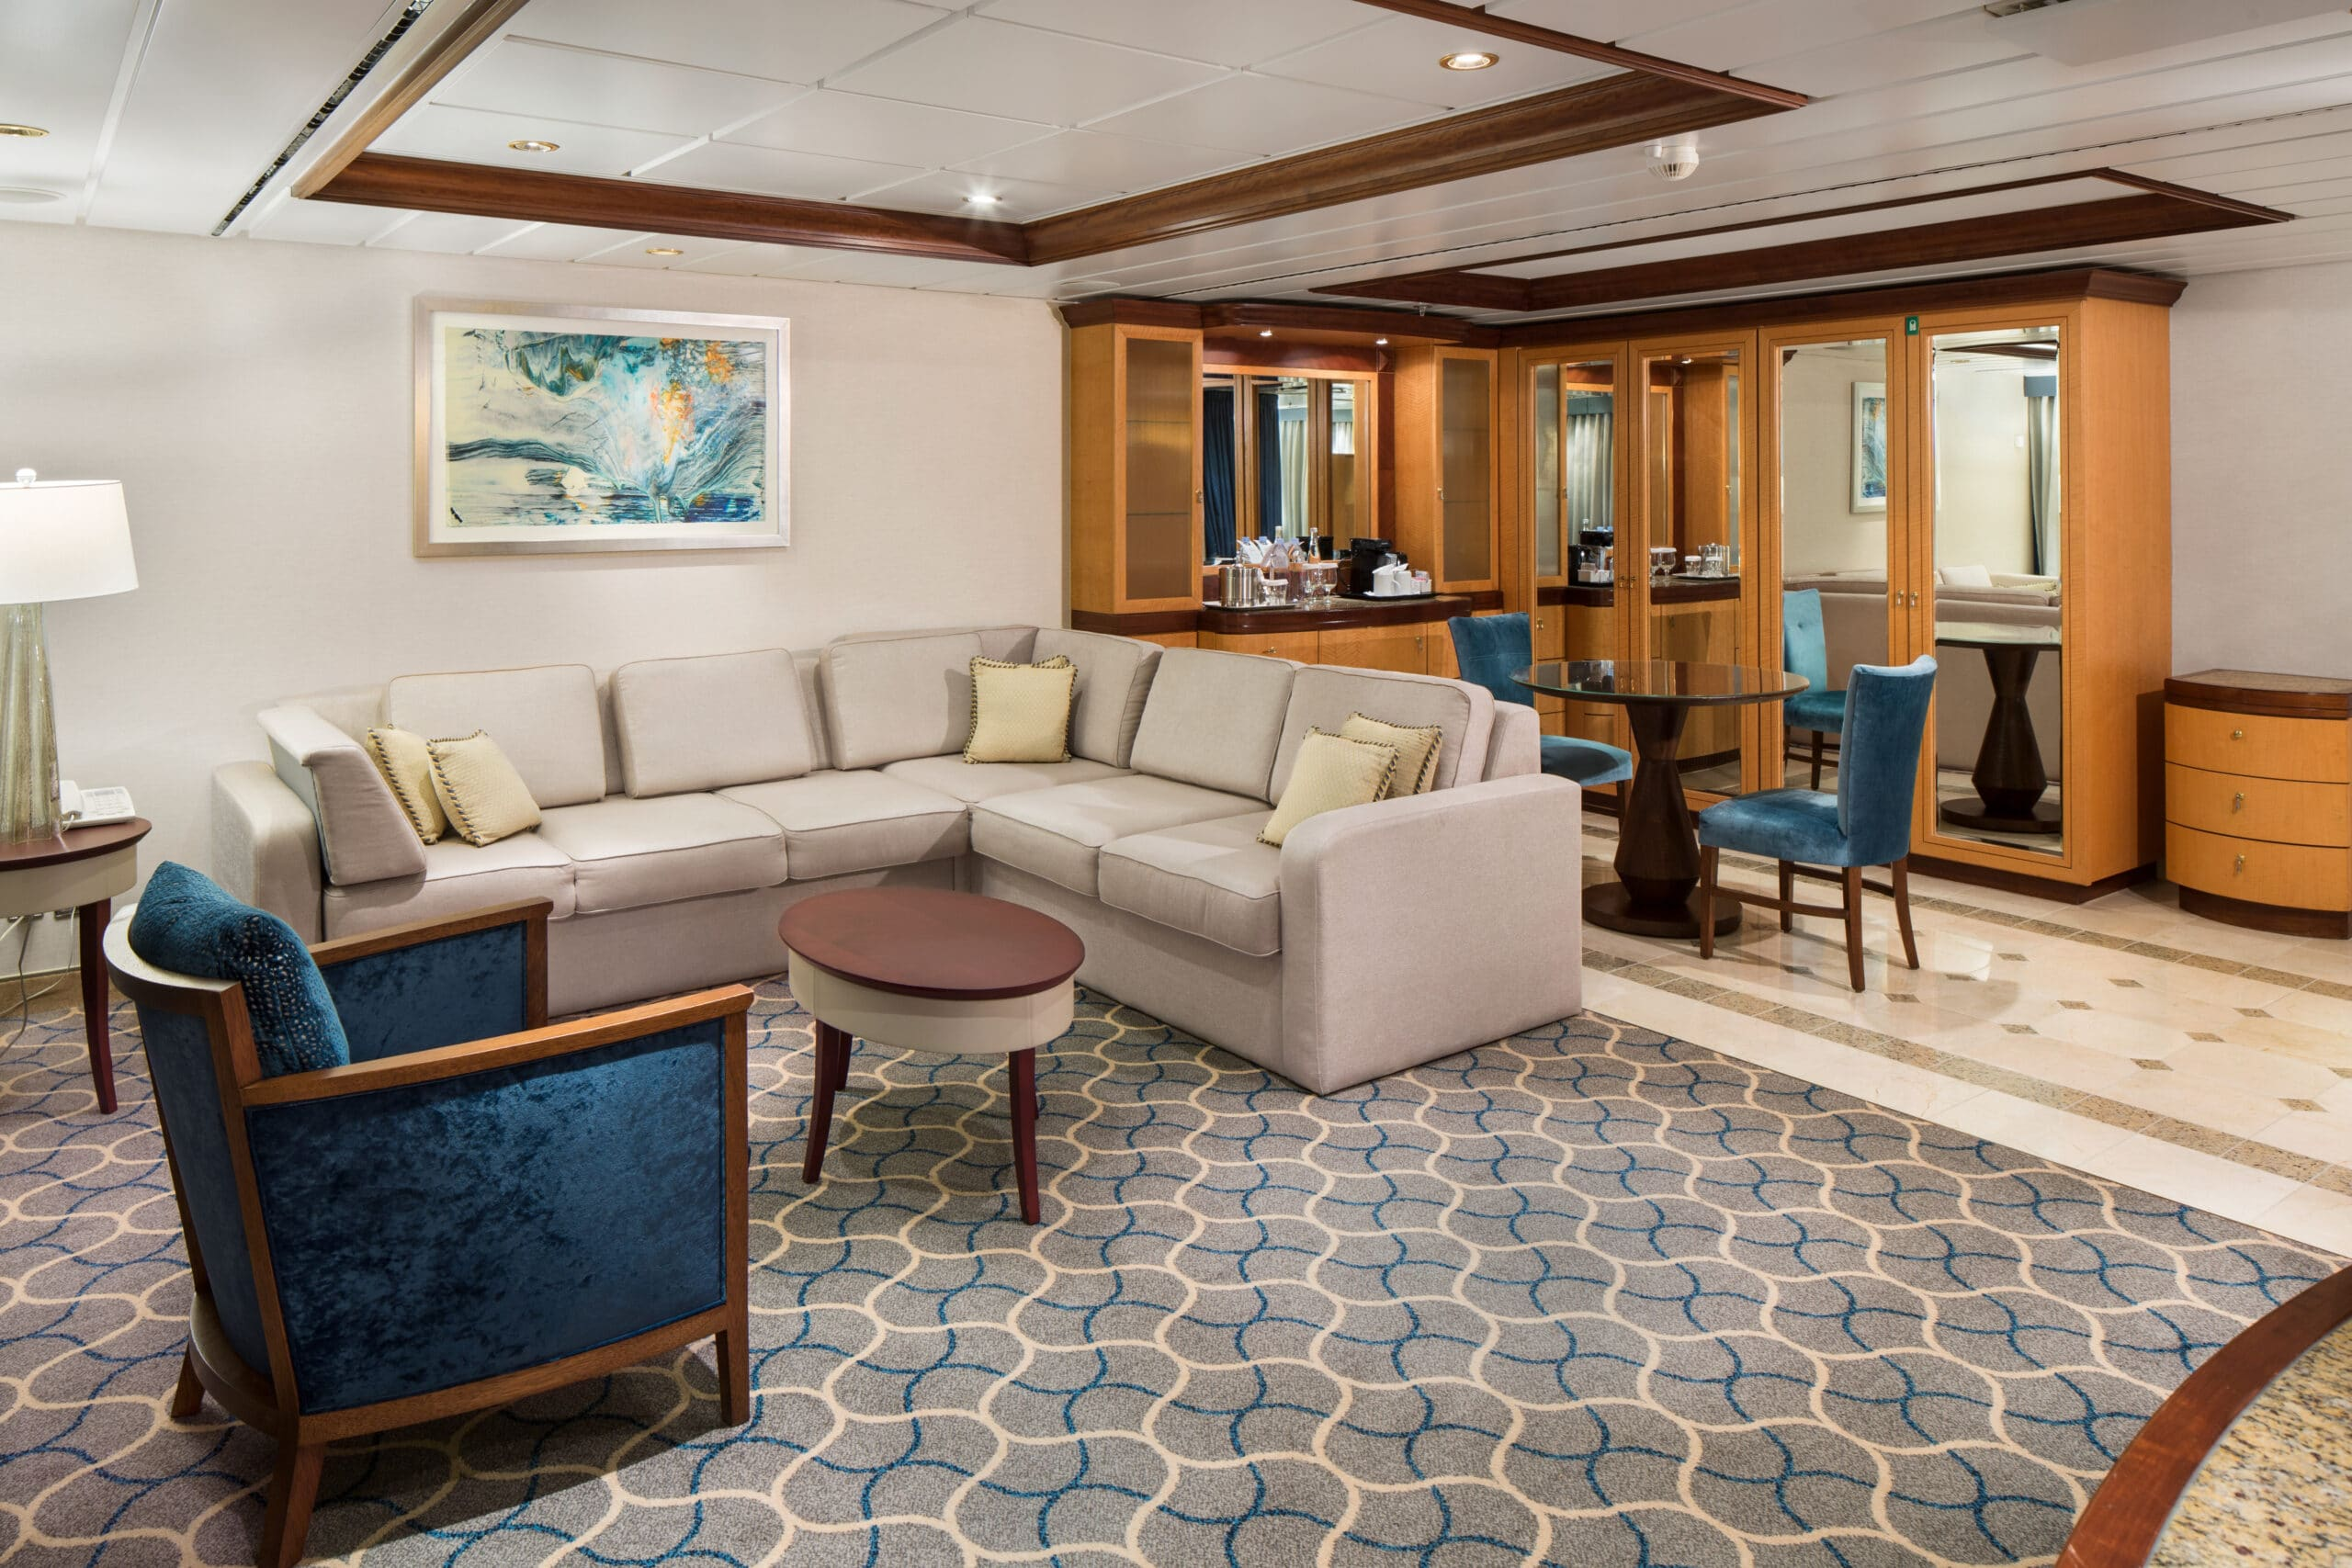 Royal-Caribbean-International-Jewel-of-the-Seas-schip-cruiseschip-categorie-OS-Owner-Suite